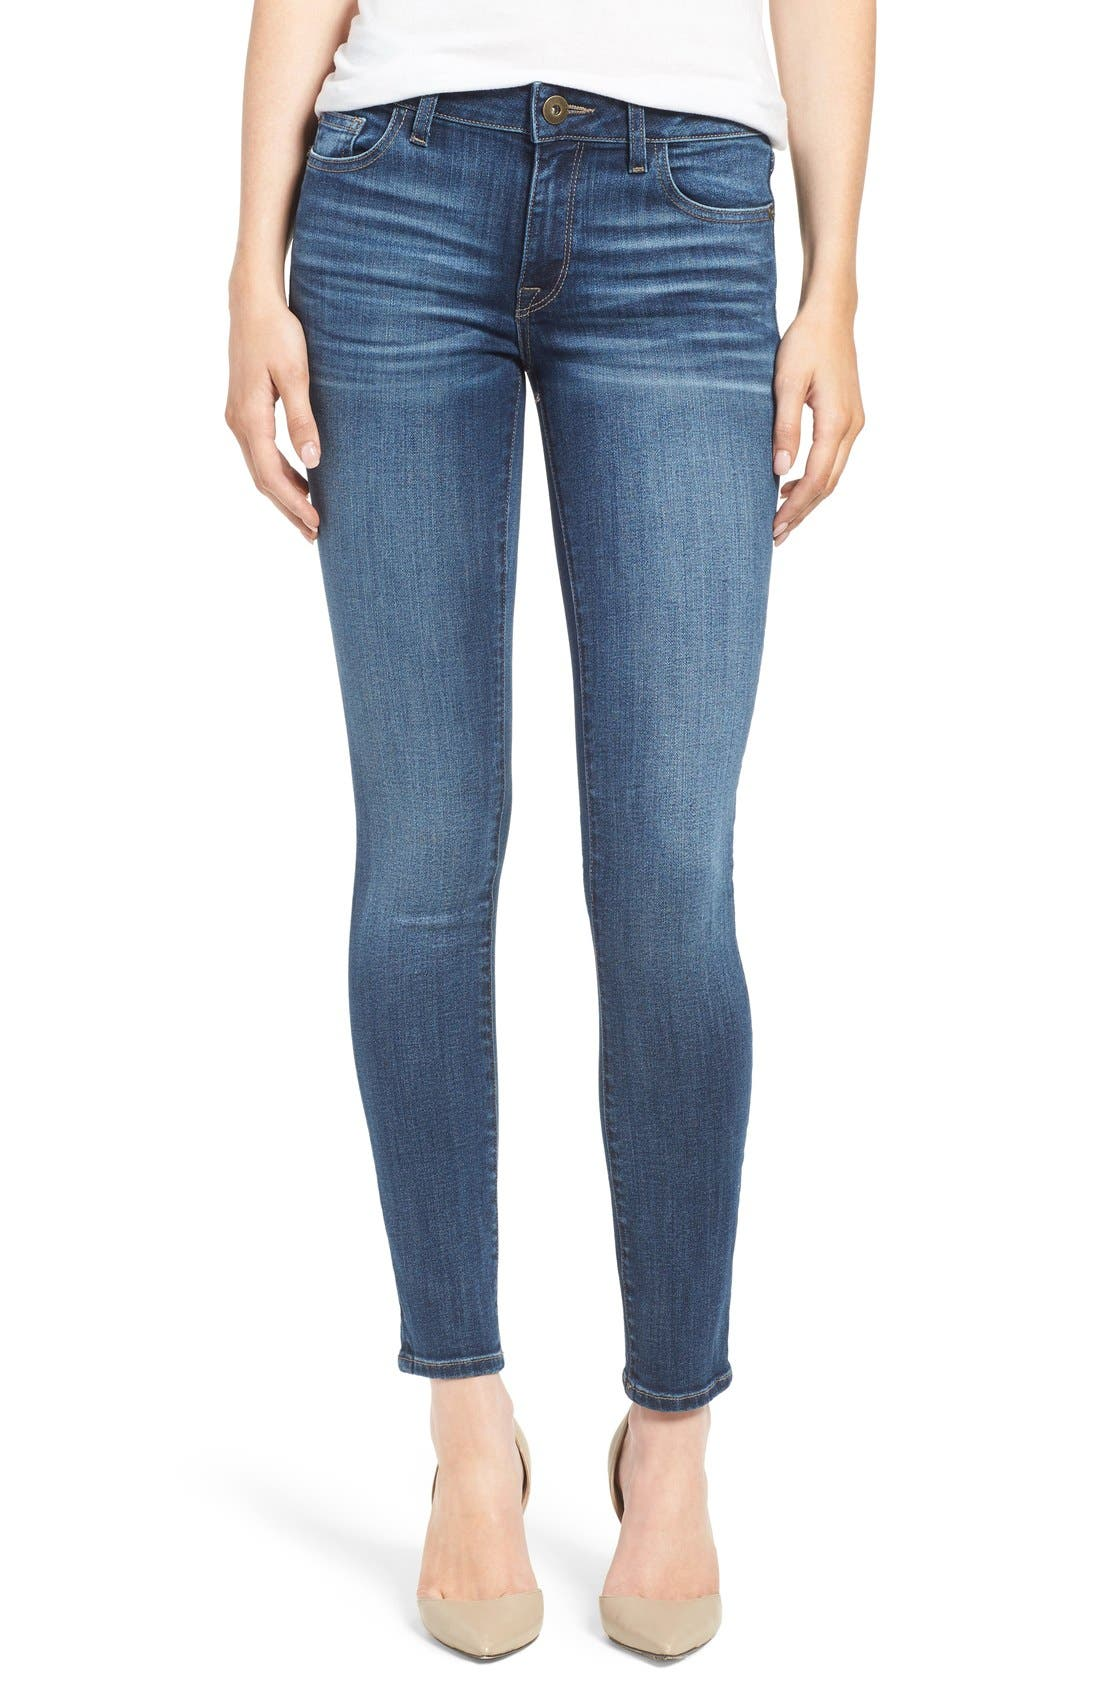 Alternate Image 1 Selected - DL1961 'Florence' Skinny Jeans (Athena)